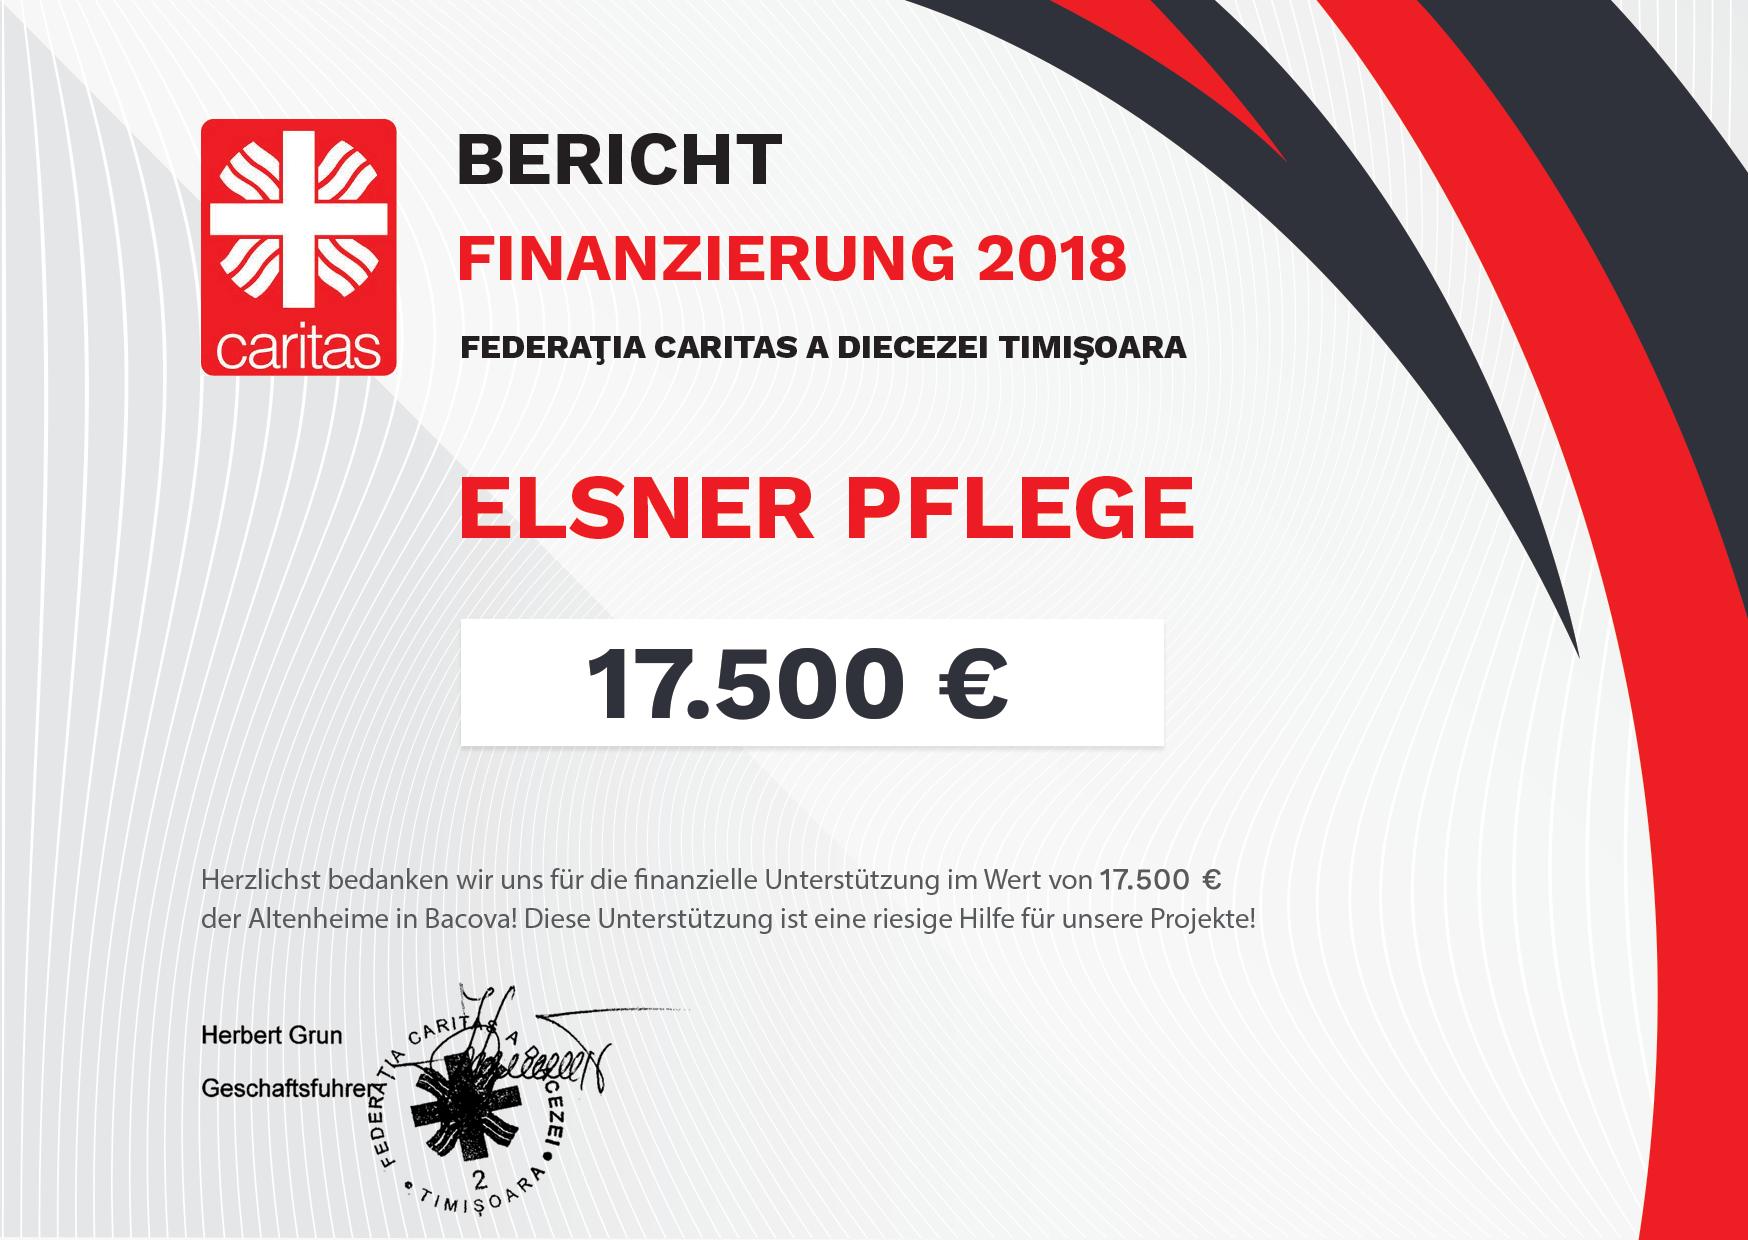 Caritas Bericht Finanzierung 2018 Elsner Pflege